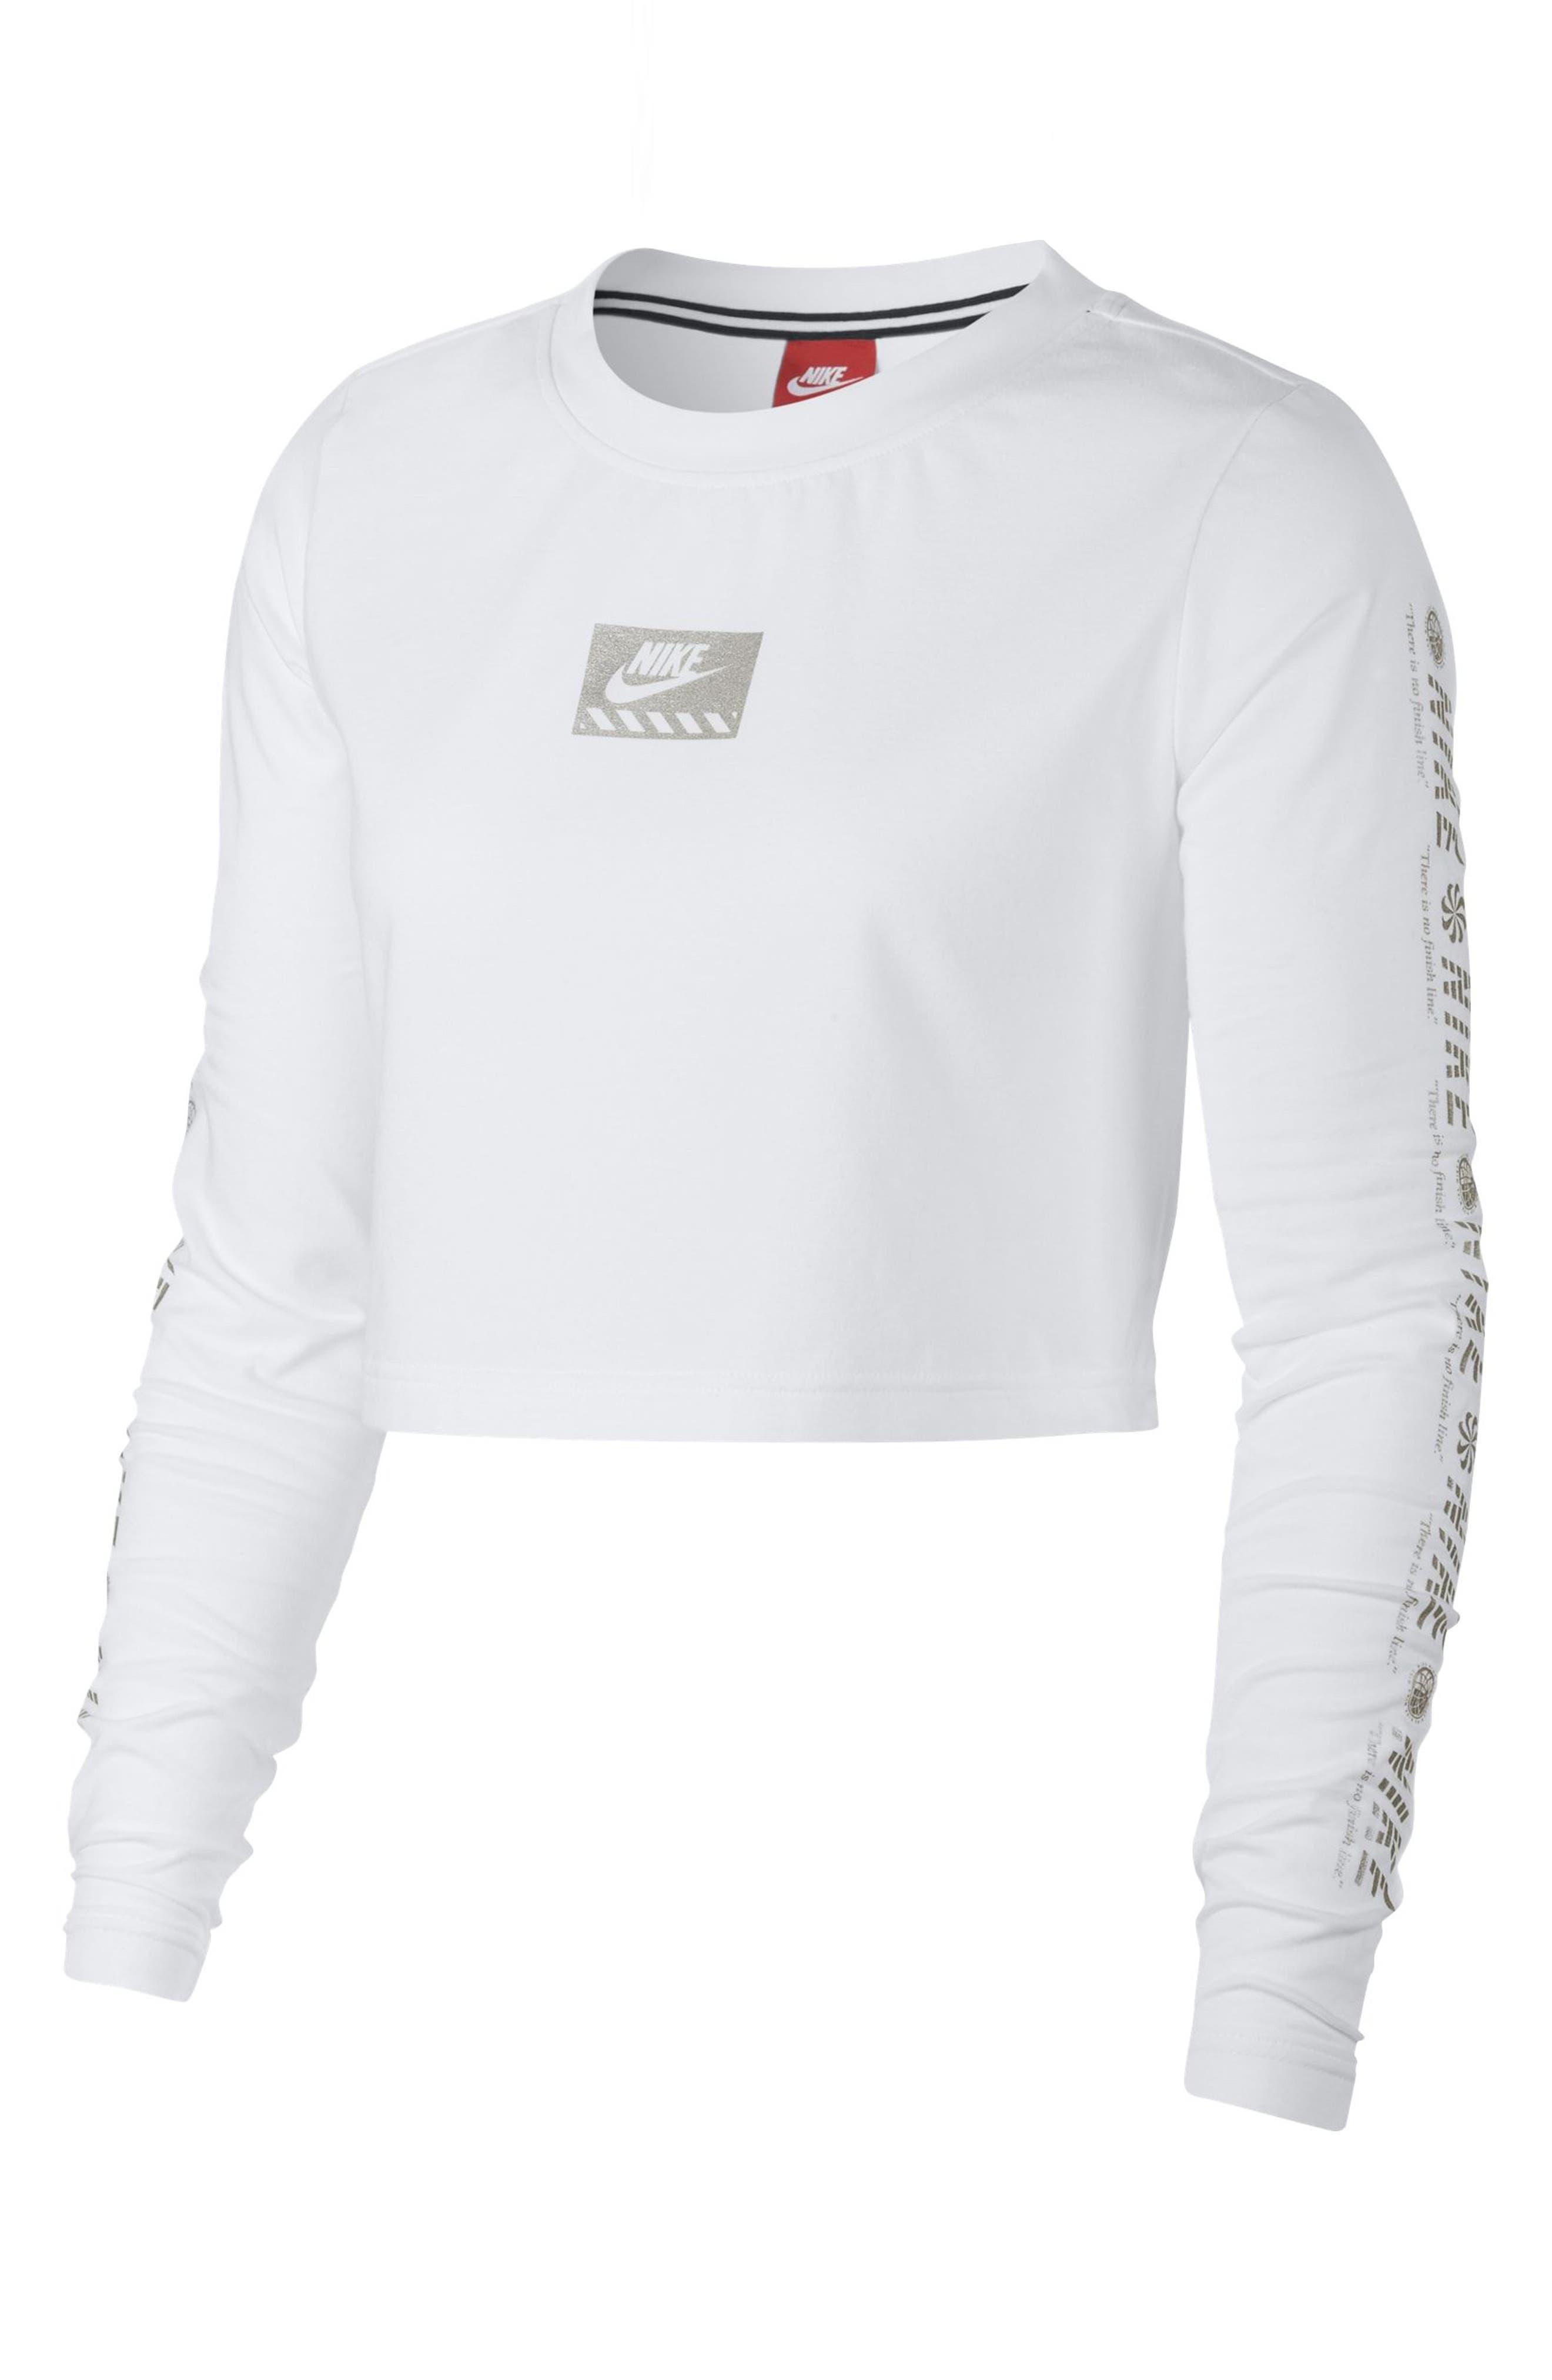 Women's Sportswear Long Sleeve Crop Top,                         Main,                         color, White/ Metallic Silver